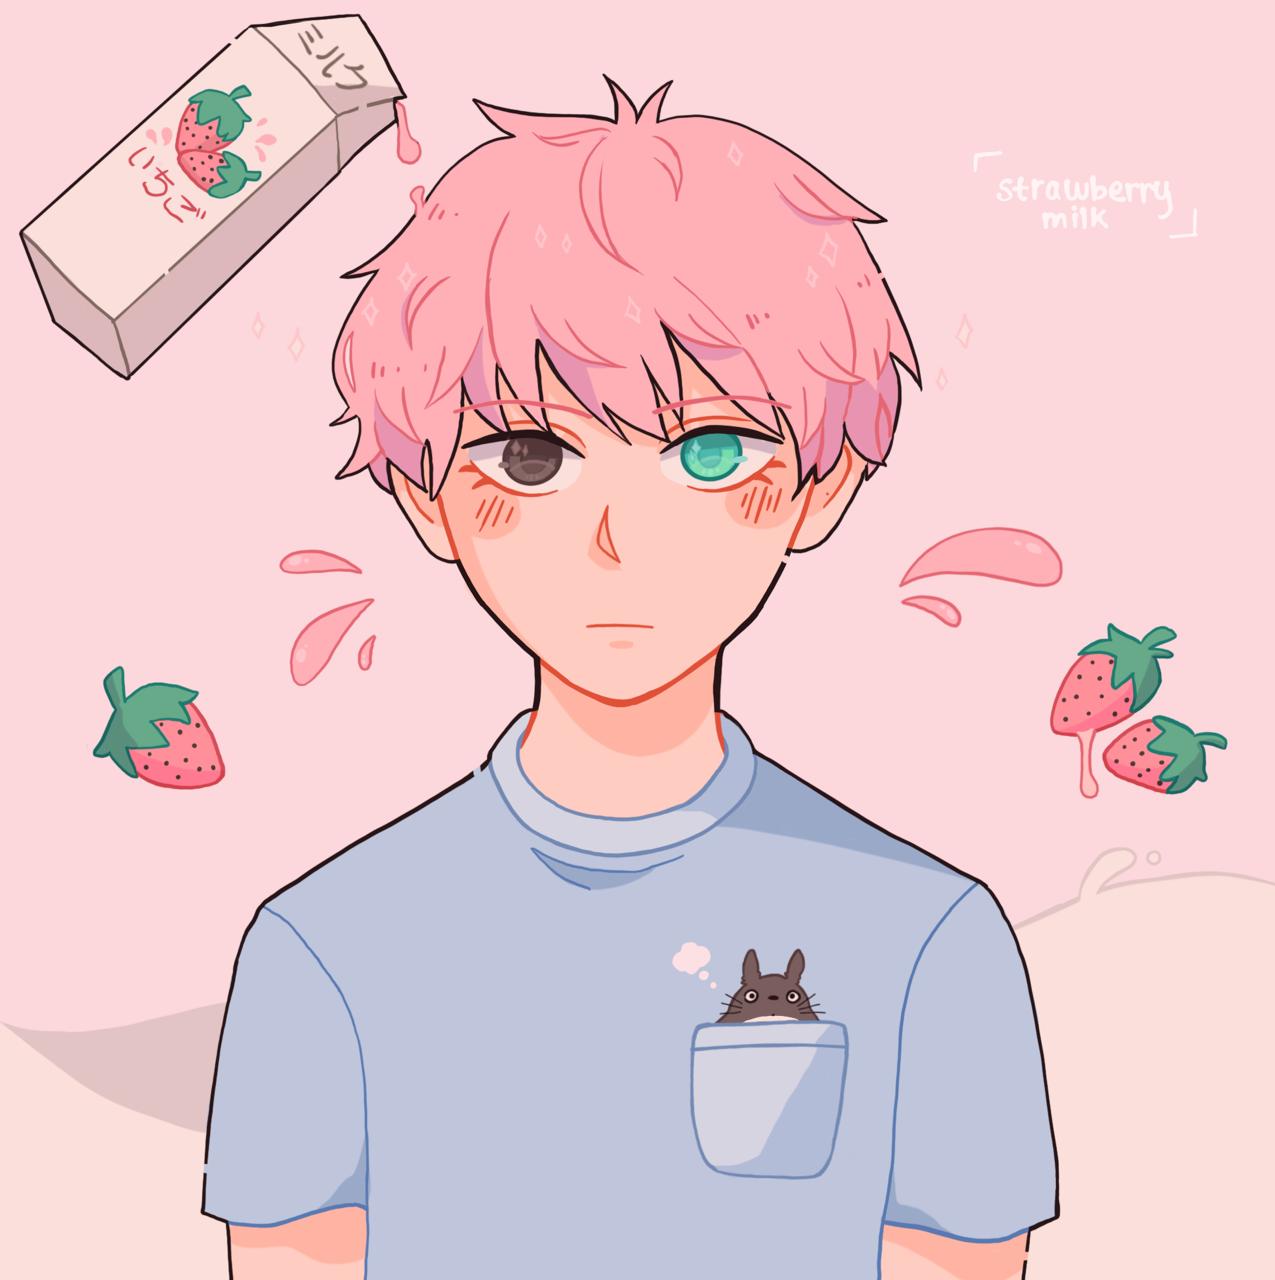 strawberry milk Todoroki Shotō in 2020 | Strawberry milk ...